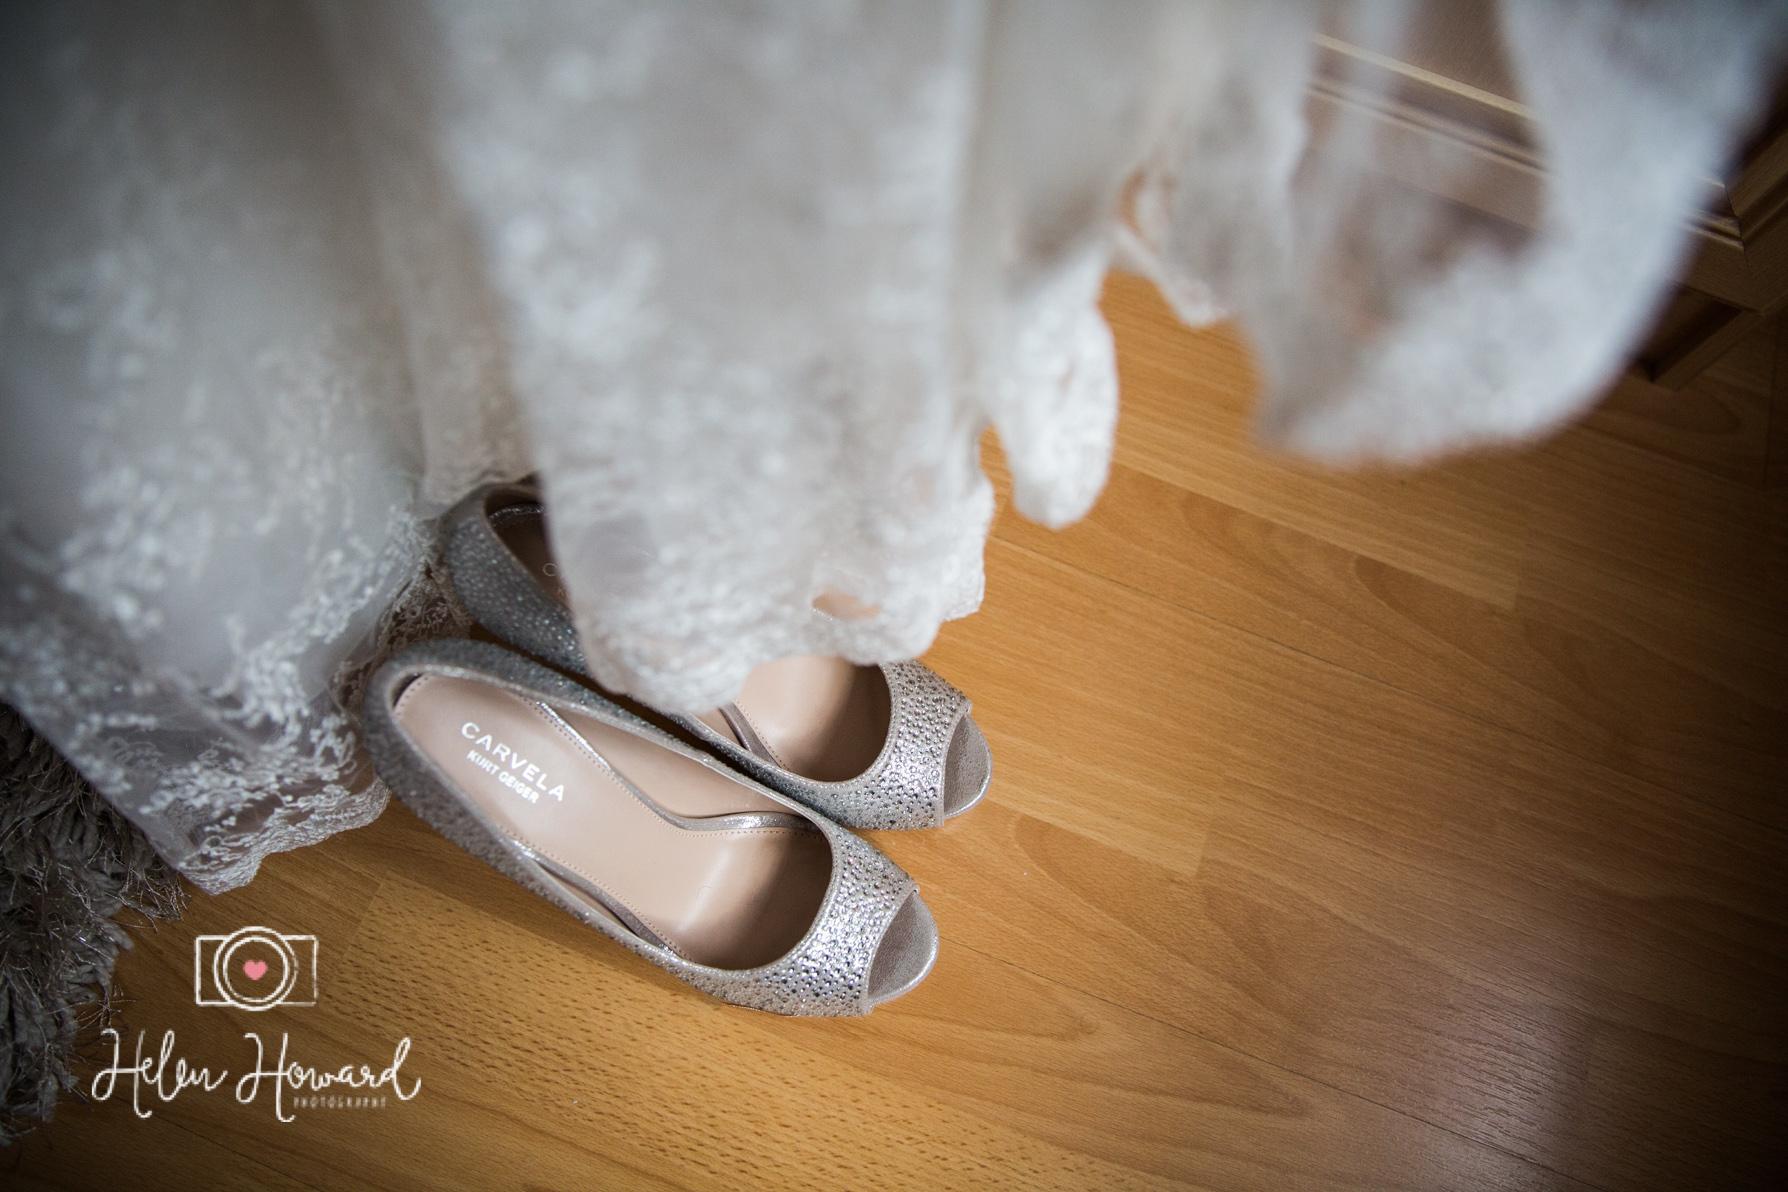 Shustoke Farm Barns Wedding Photography by Helen Howard-4.jpg